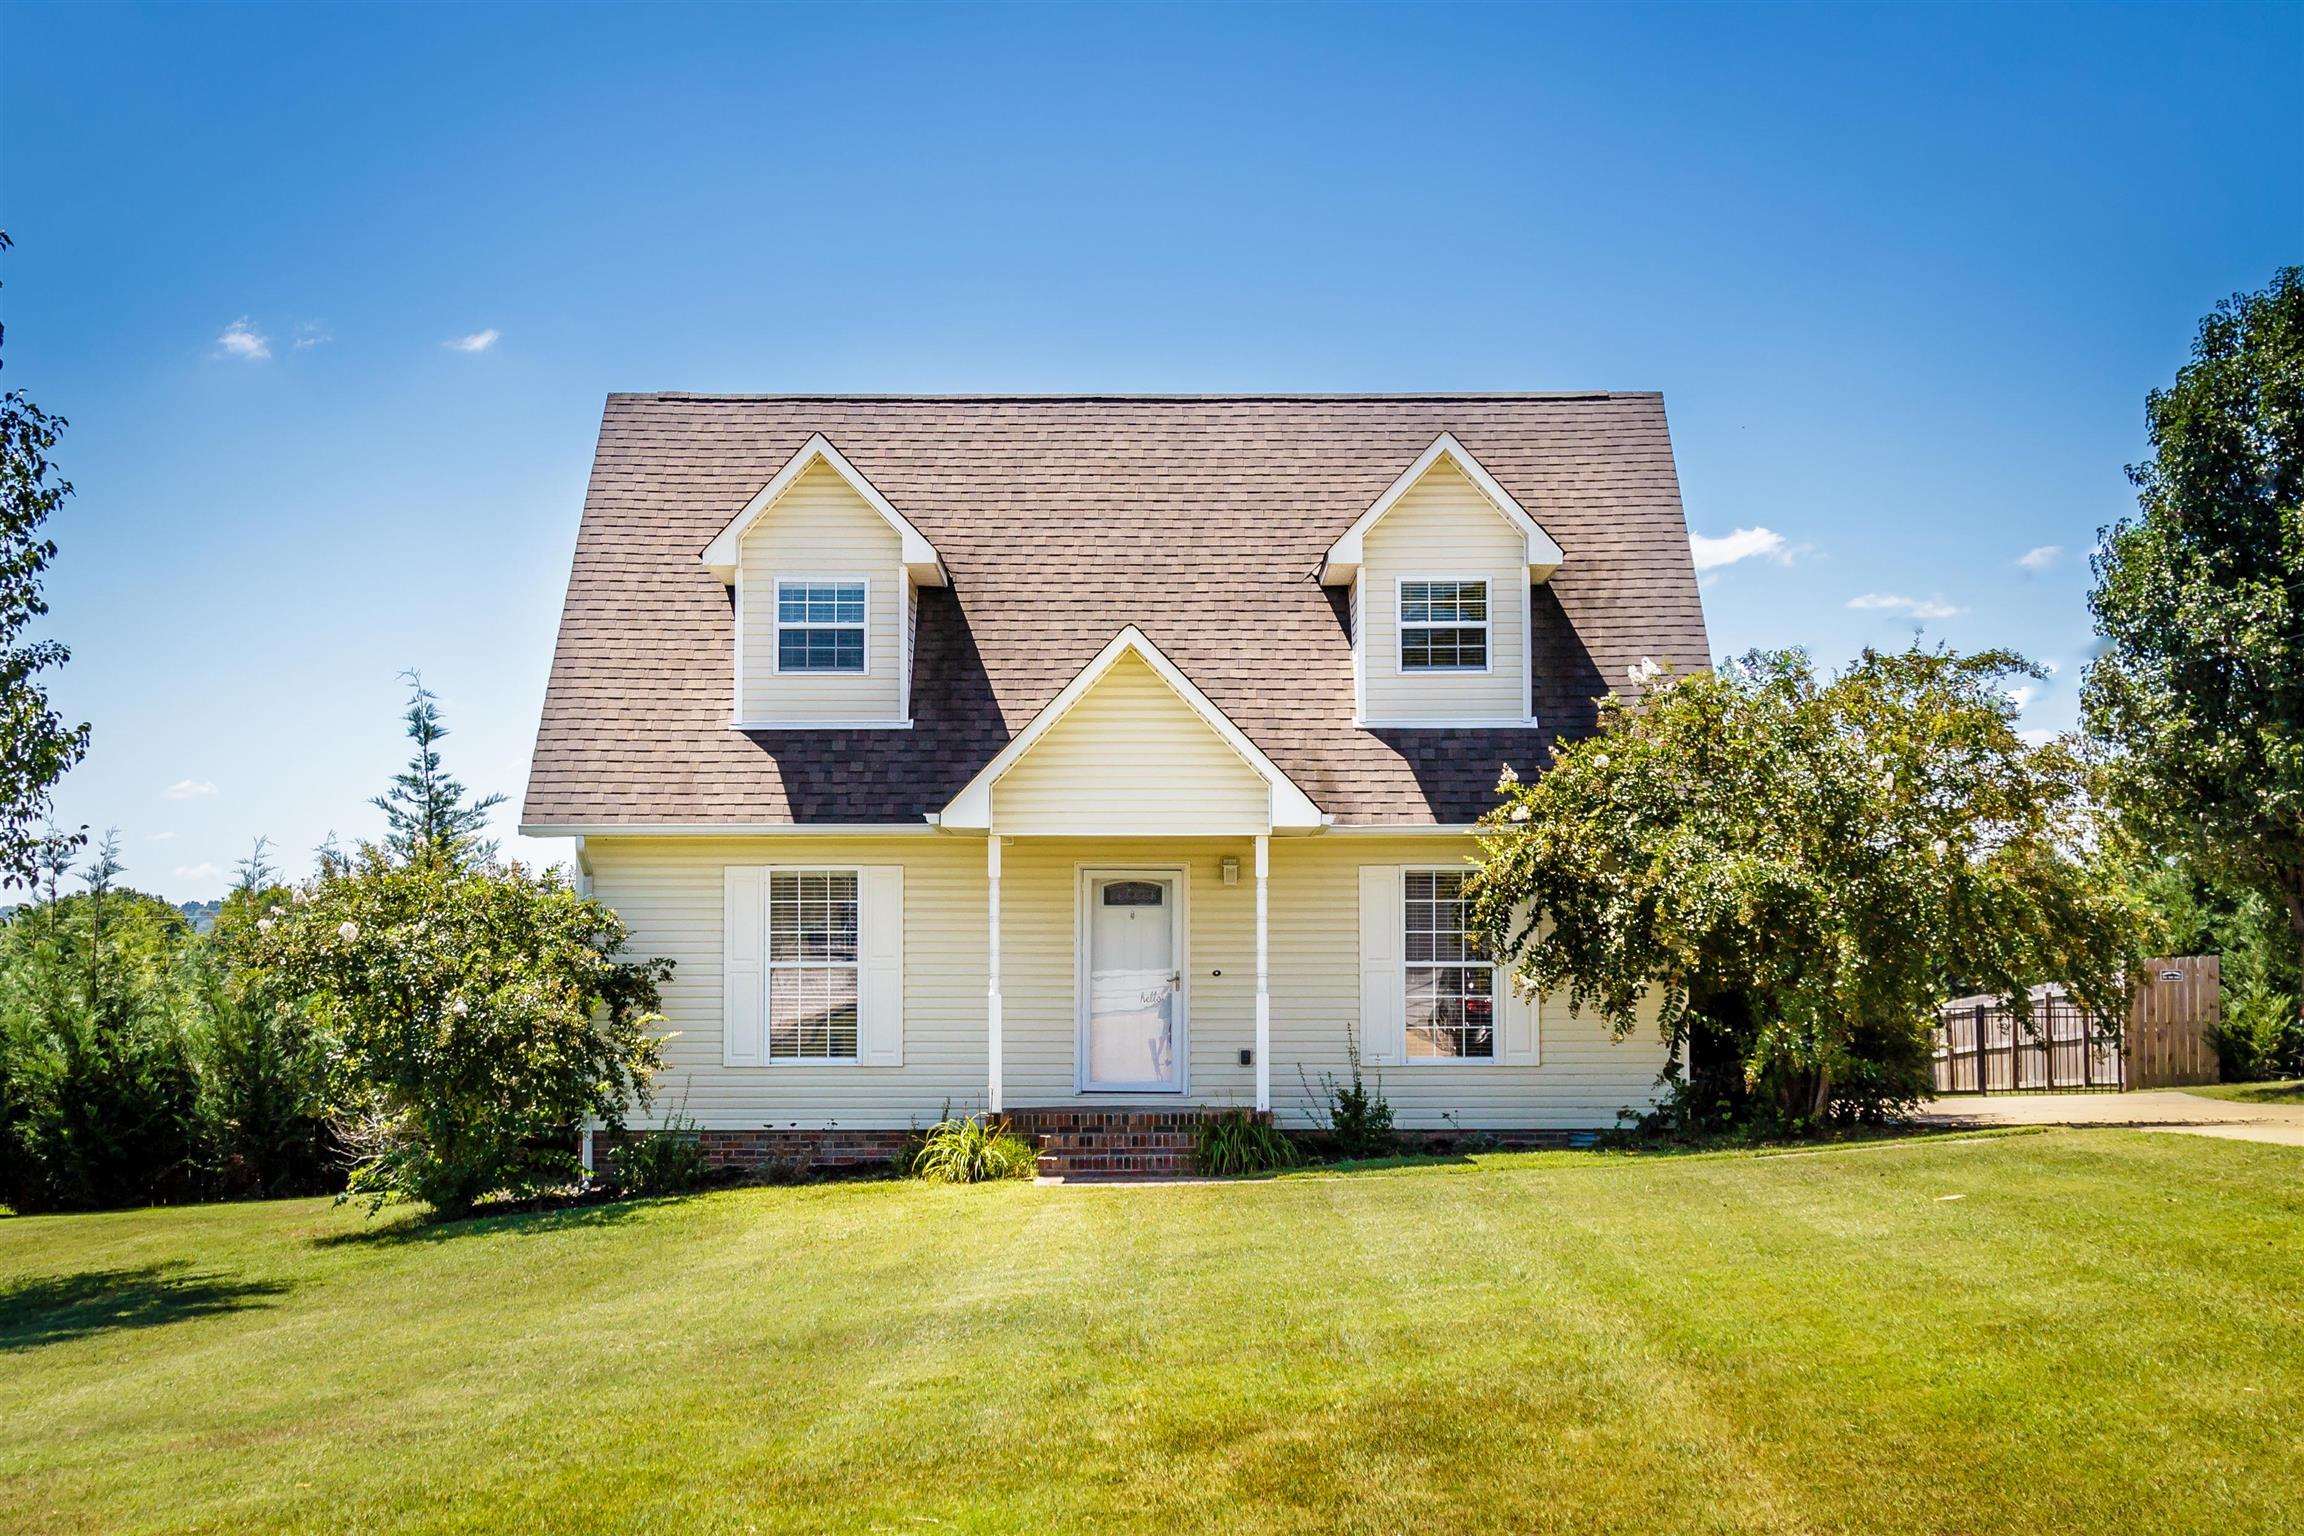 1825 Braly Ln, Pulaski, TN 38478 - Pulaski, TN real estate listing